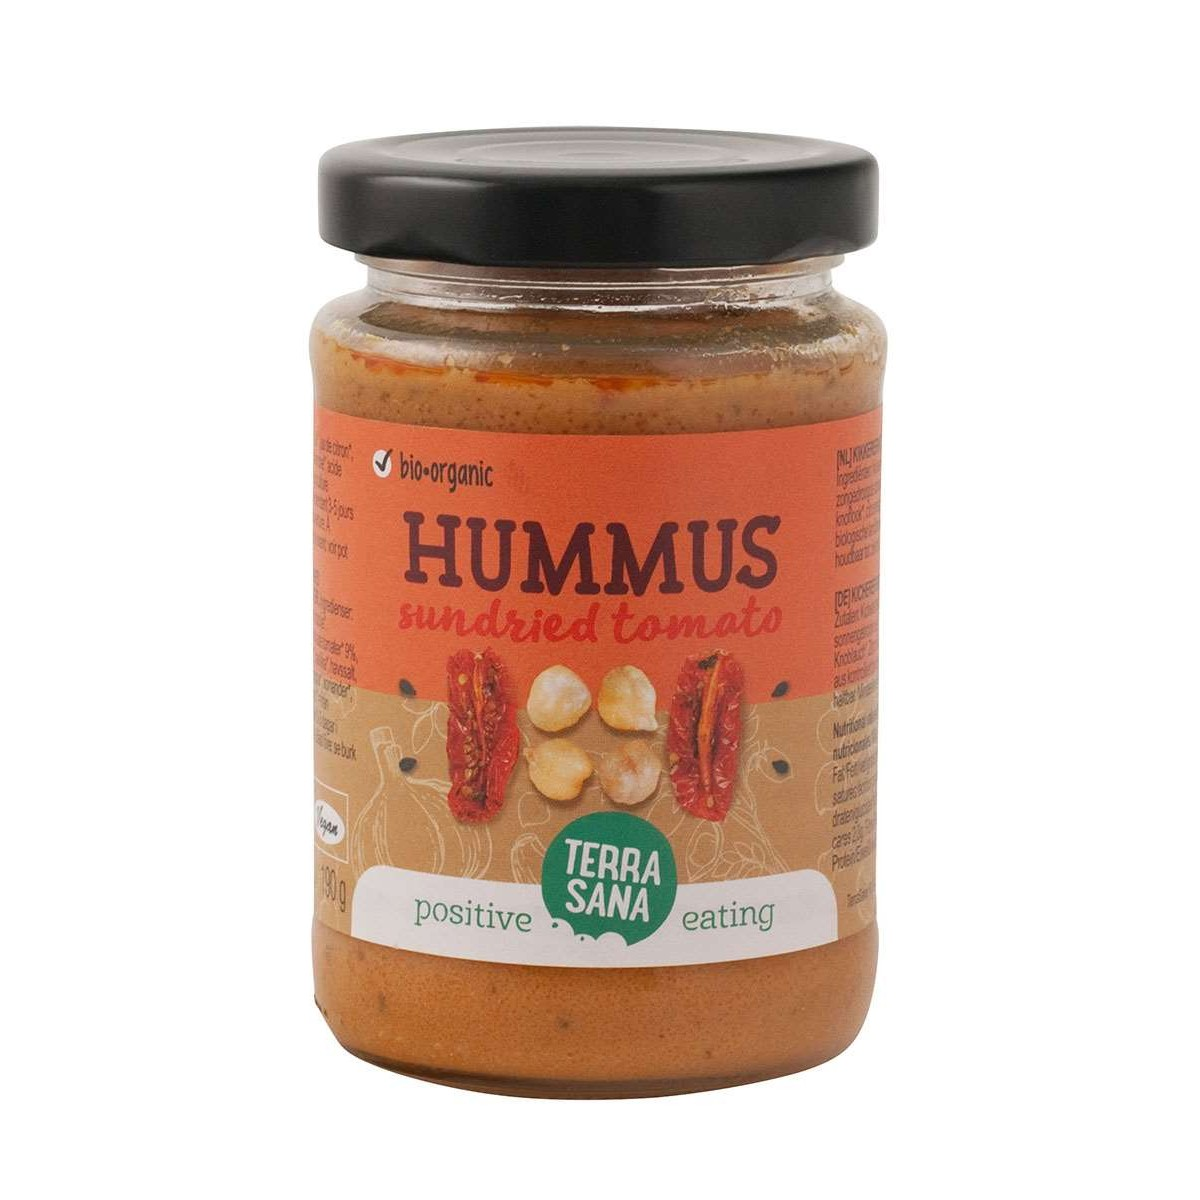 Hummus Sundried Tomato